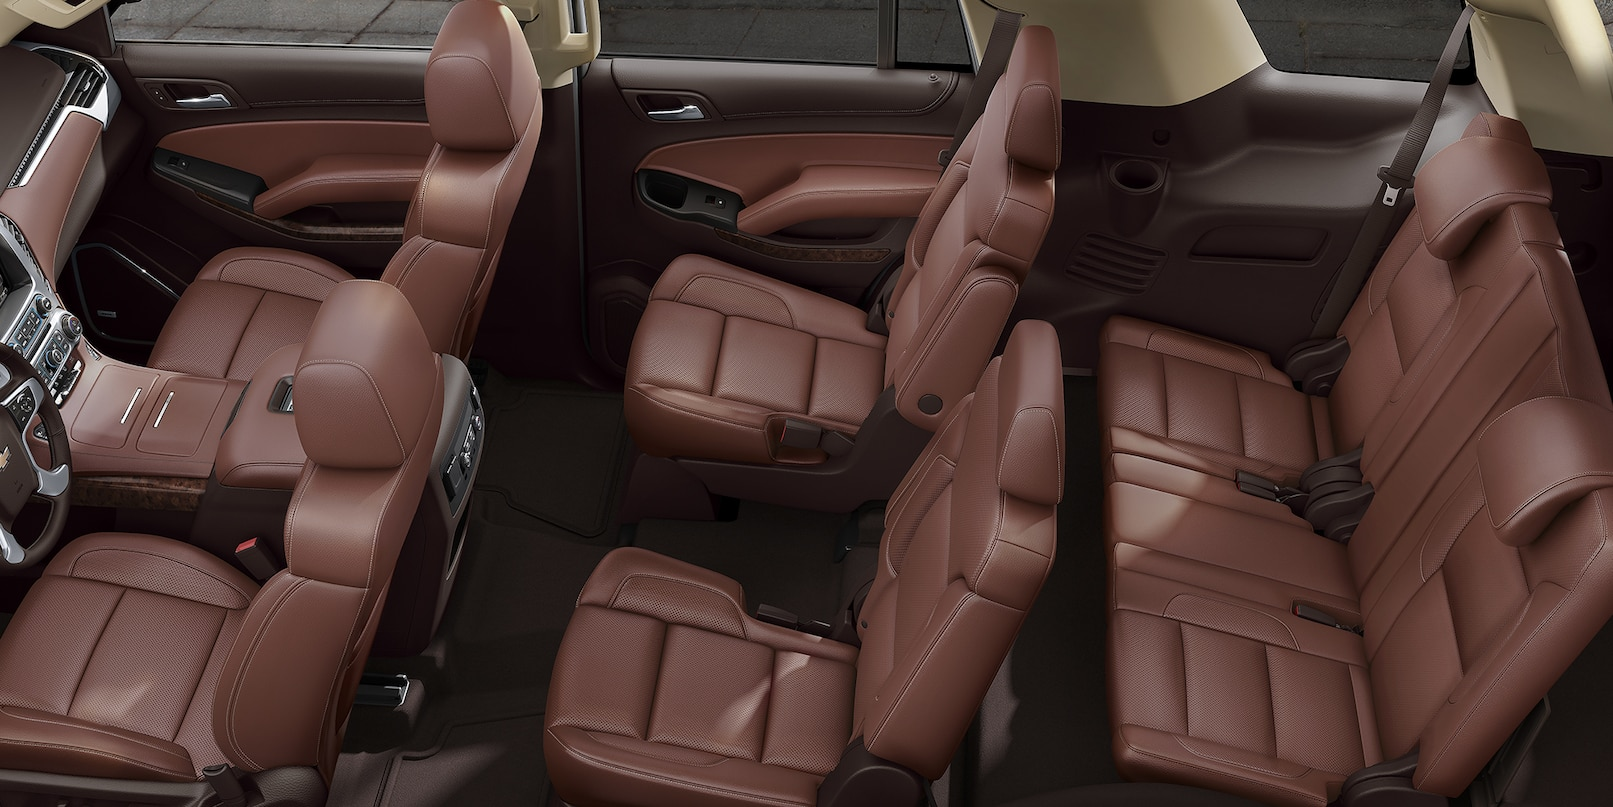 Plenty of Seating Inside the 2019 Chevrolet Tahoe!